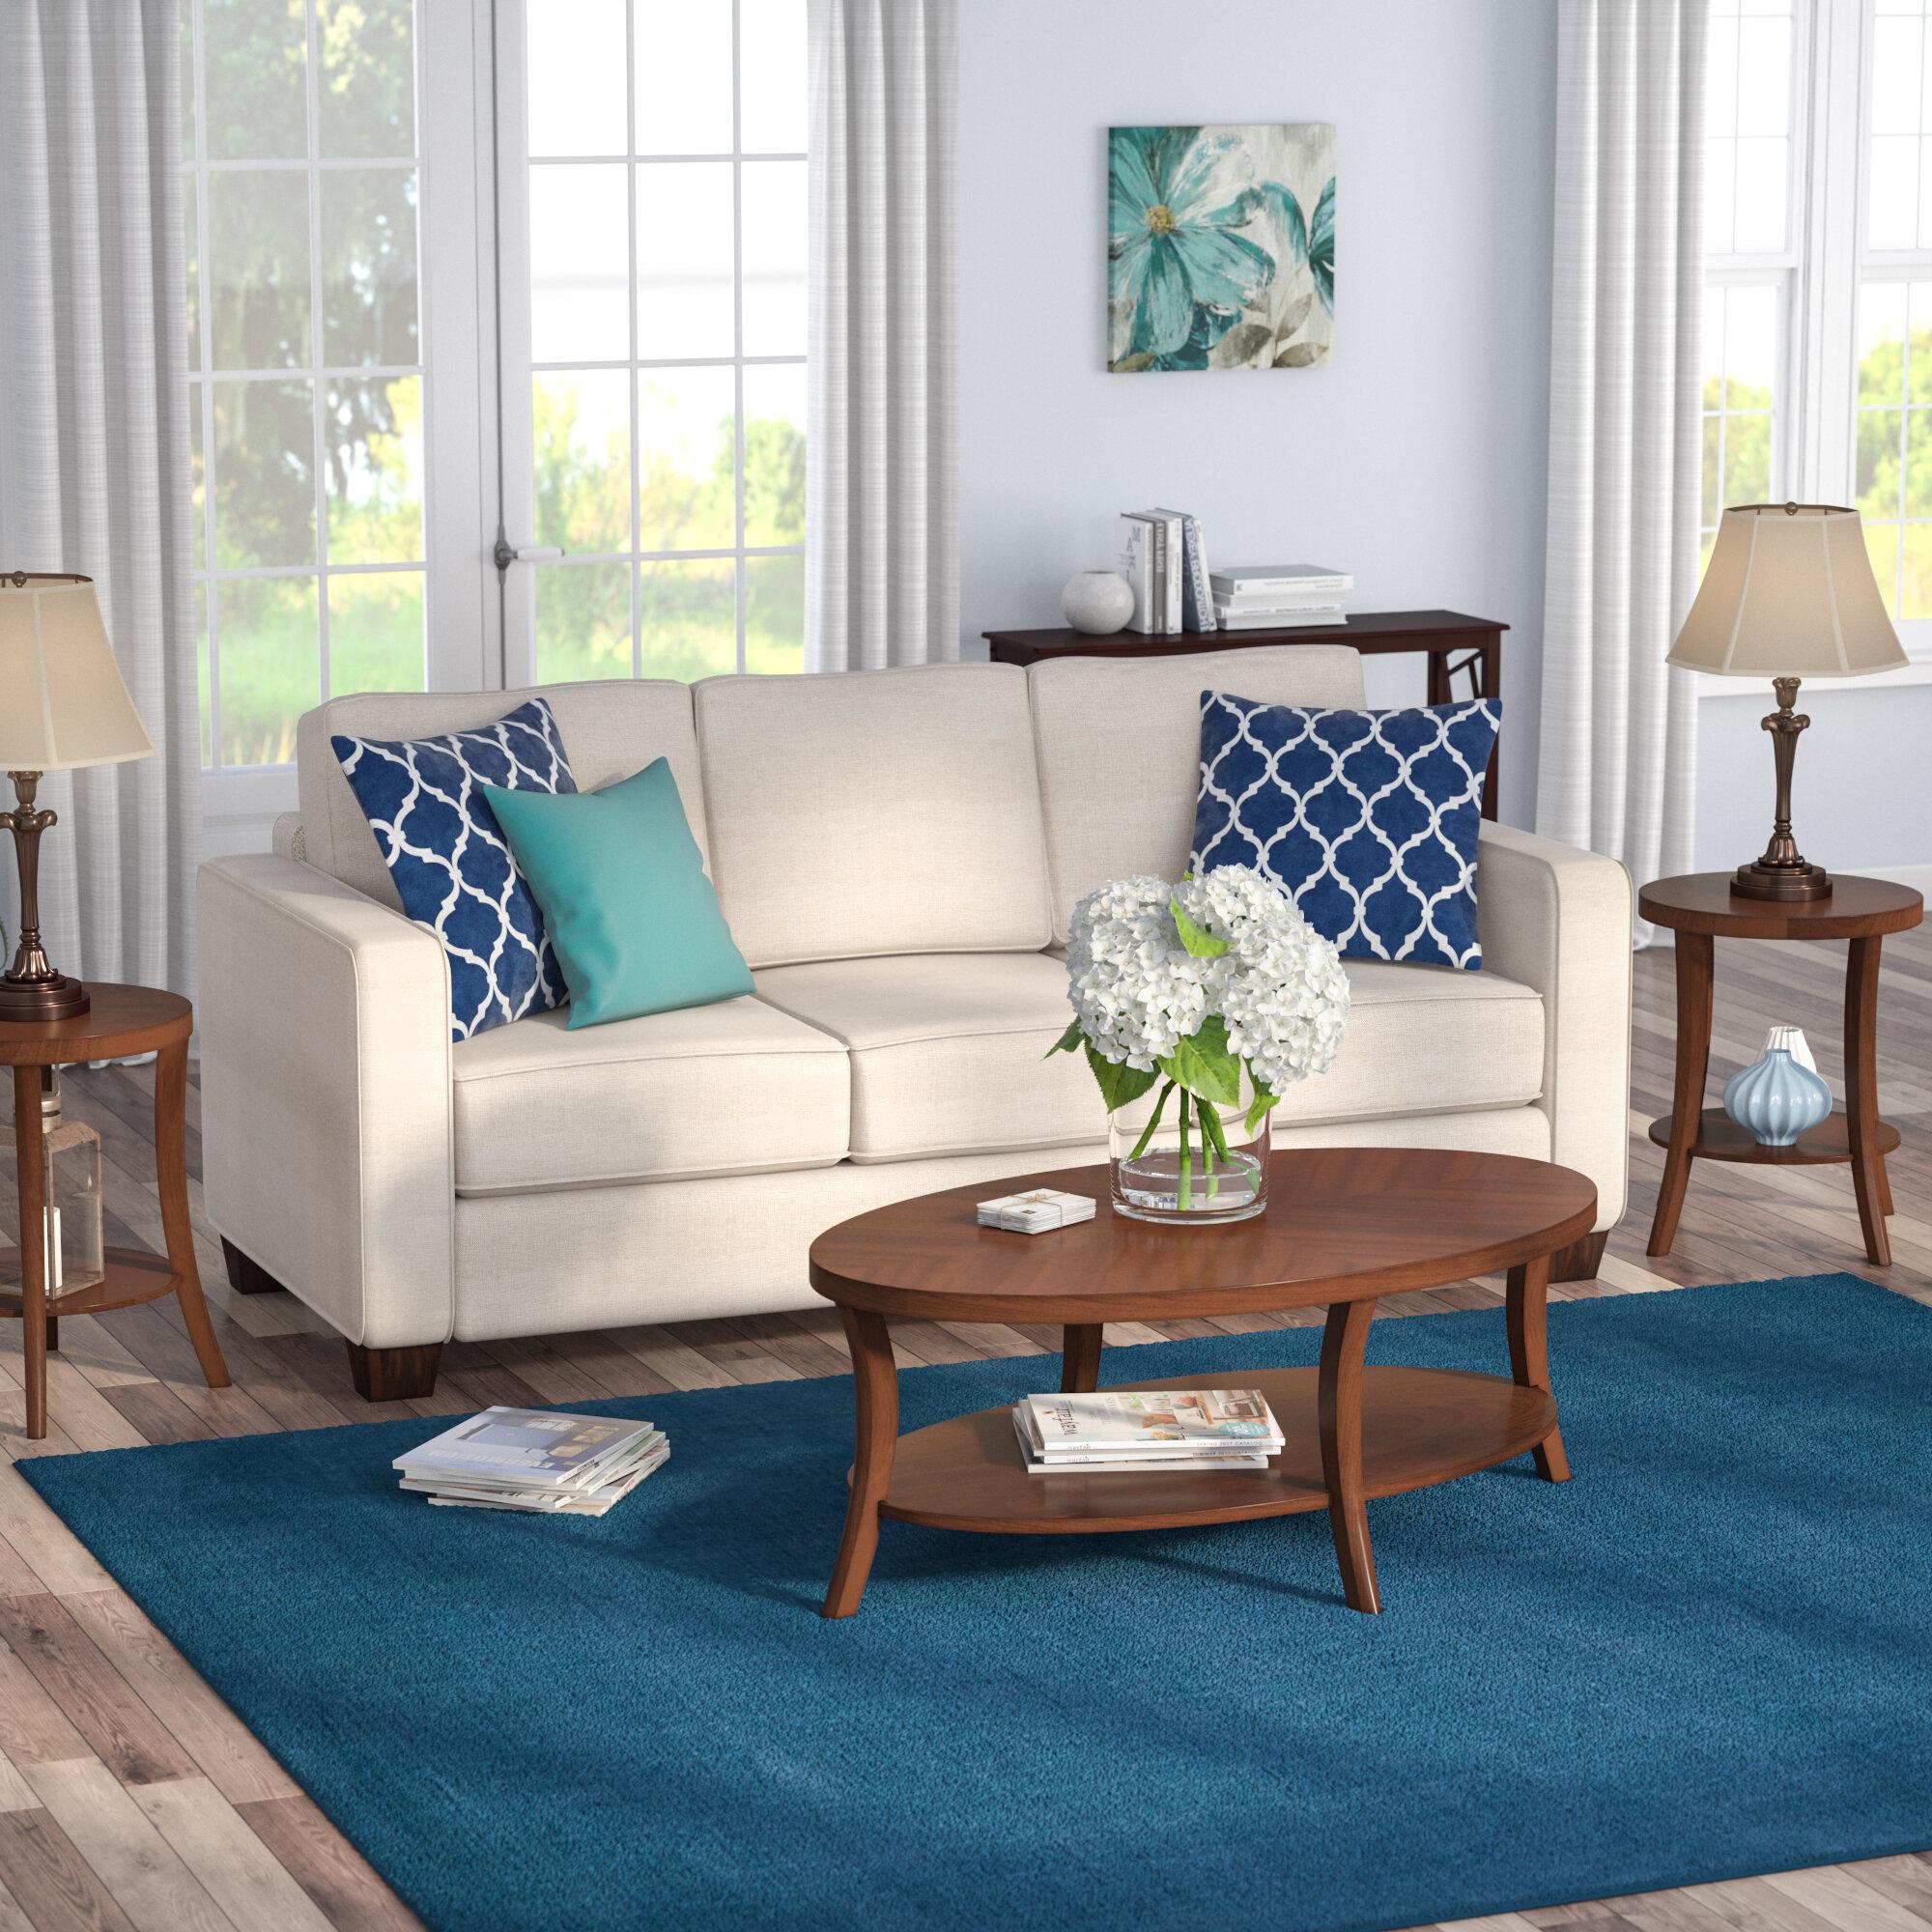 Charlton Home Wenona Transitional 3 Piece Coffee Table Set Reviews Wayfair